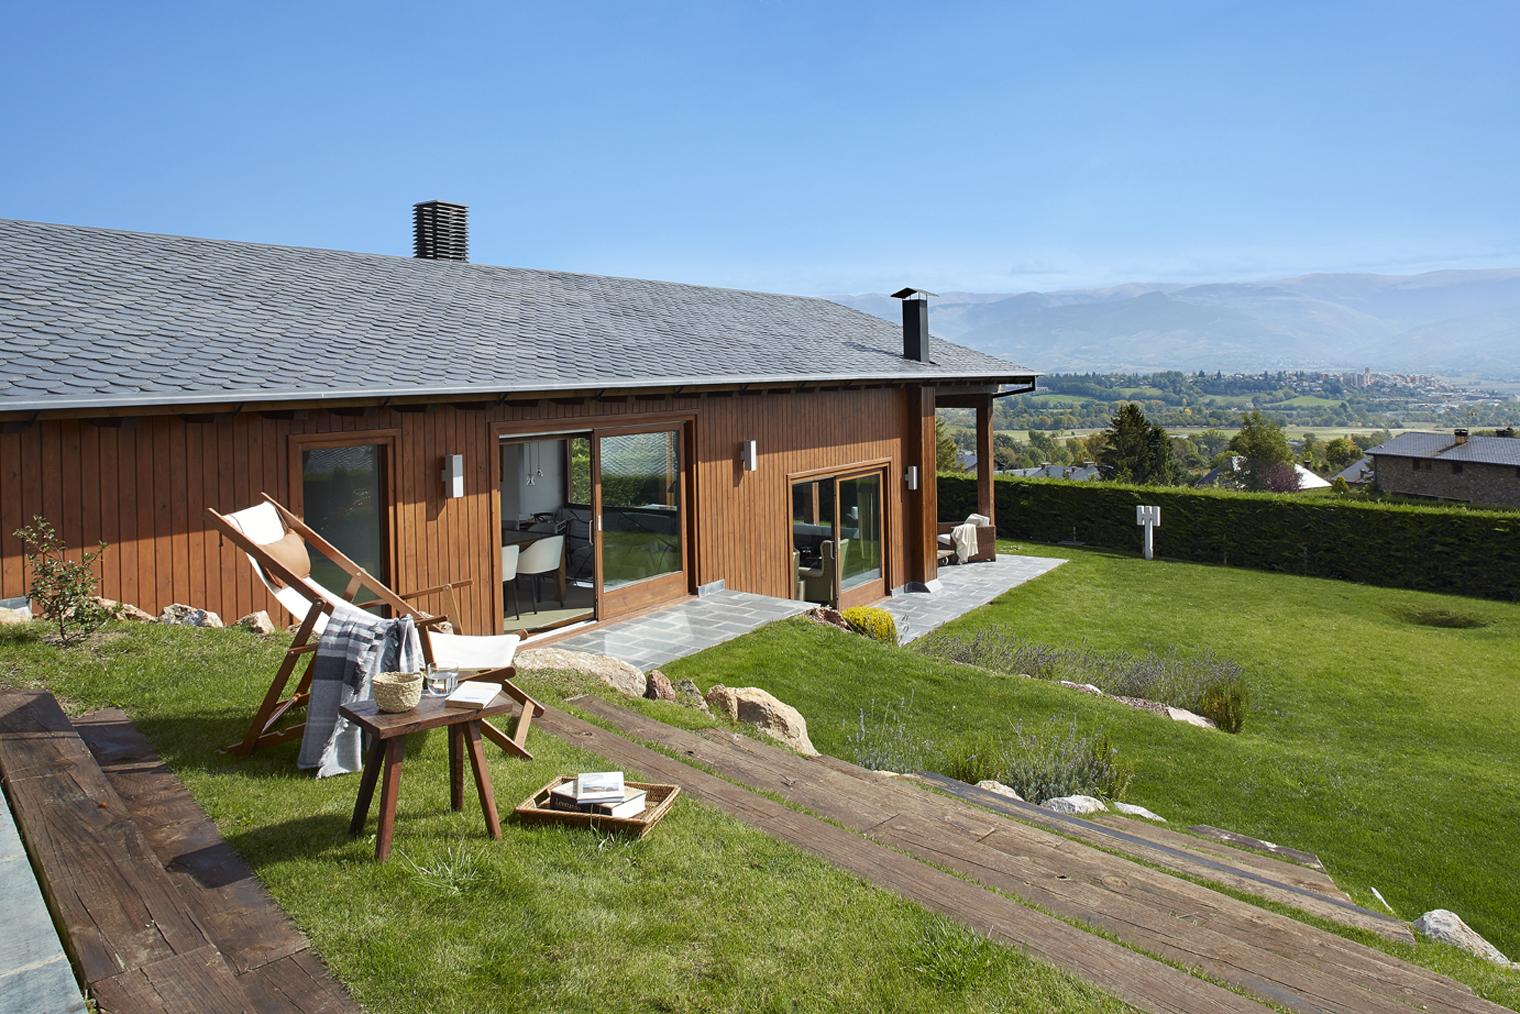 Casa en guils un refugio de monta a para disfrutar for Casas modernas rusticas